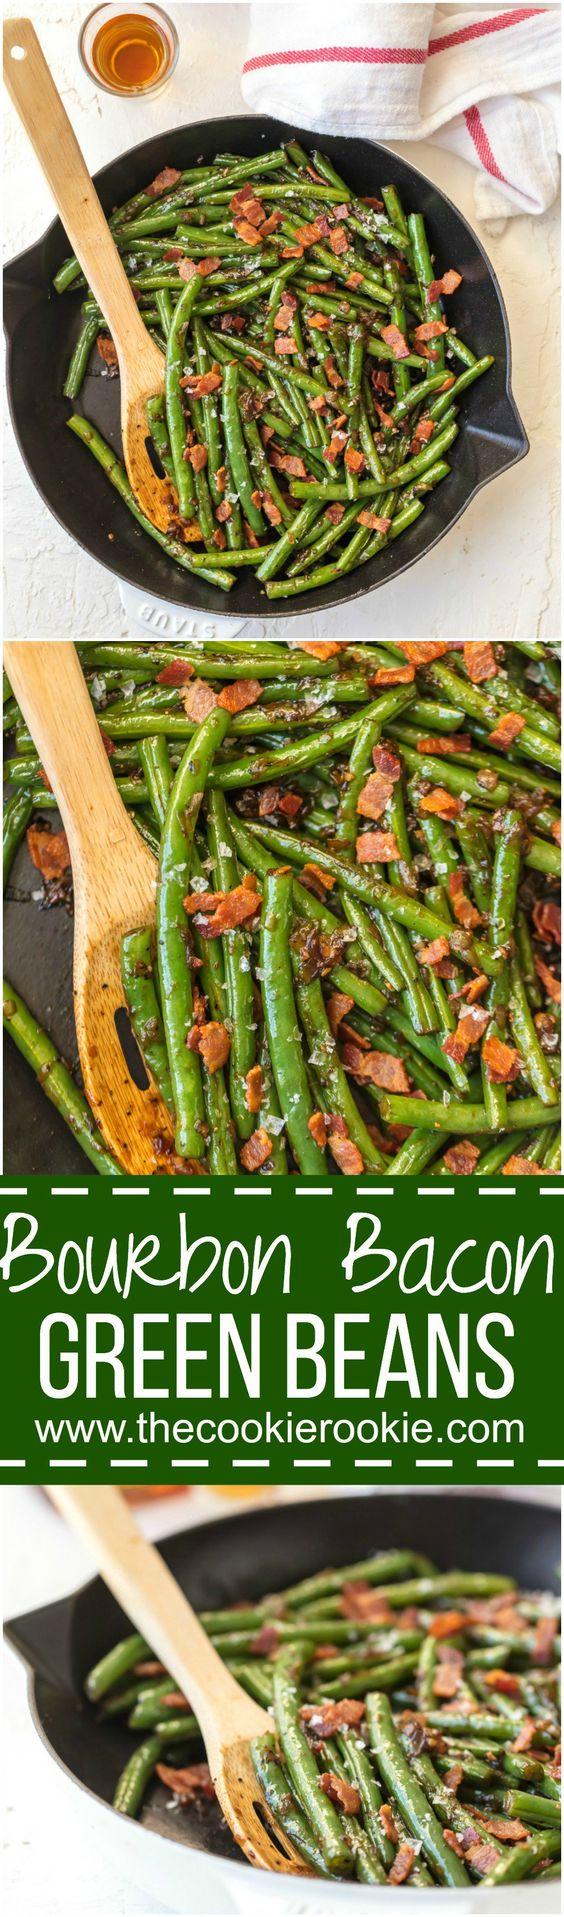 Skillet Bourbon Bacon Green Beans | The Cookie Rookie | Bloglovin'